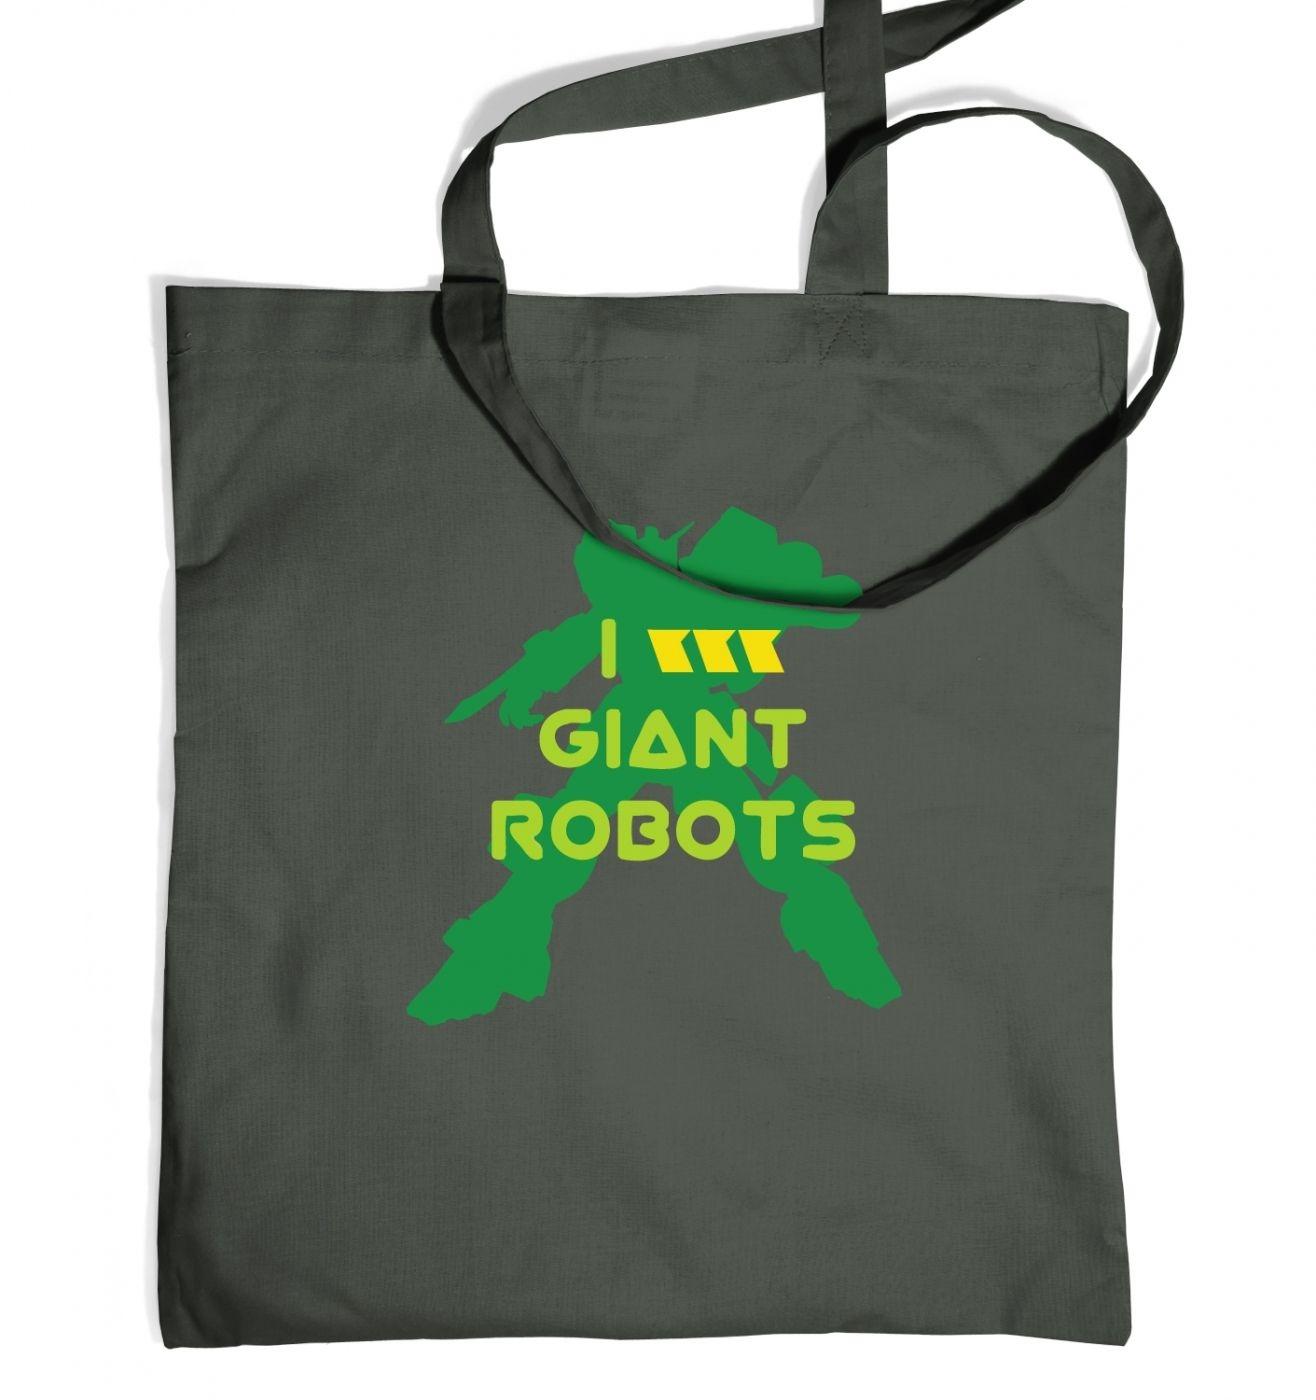 I Love Giant Robots tote bag